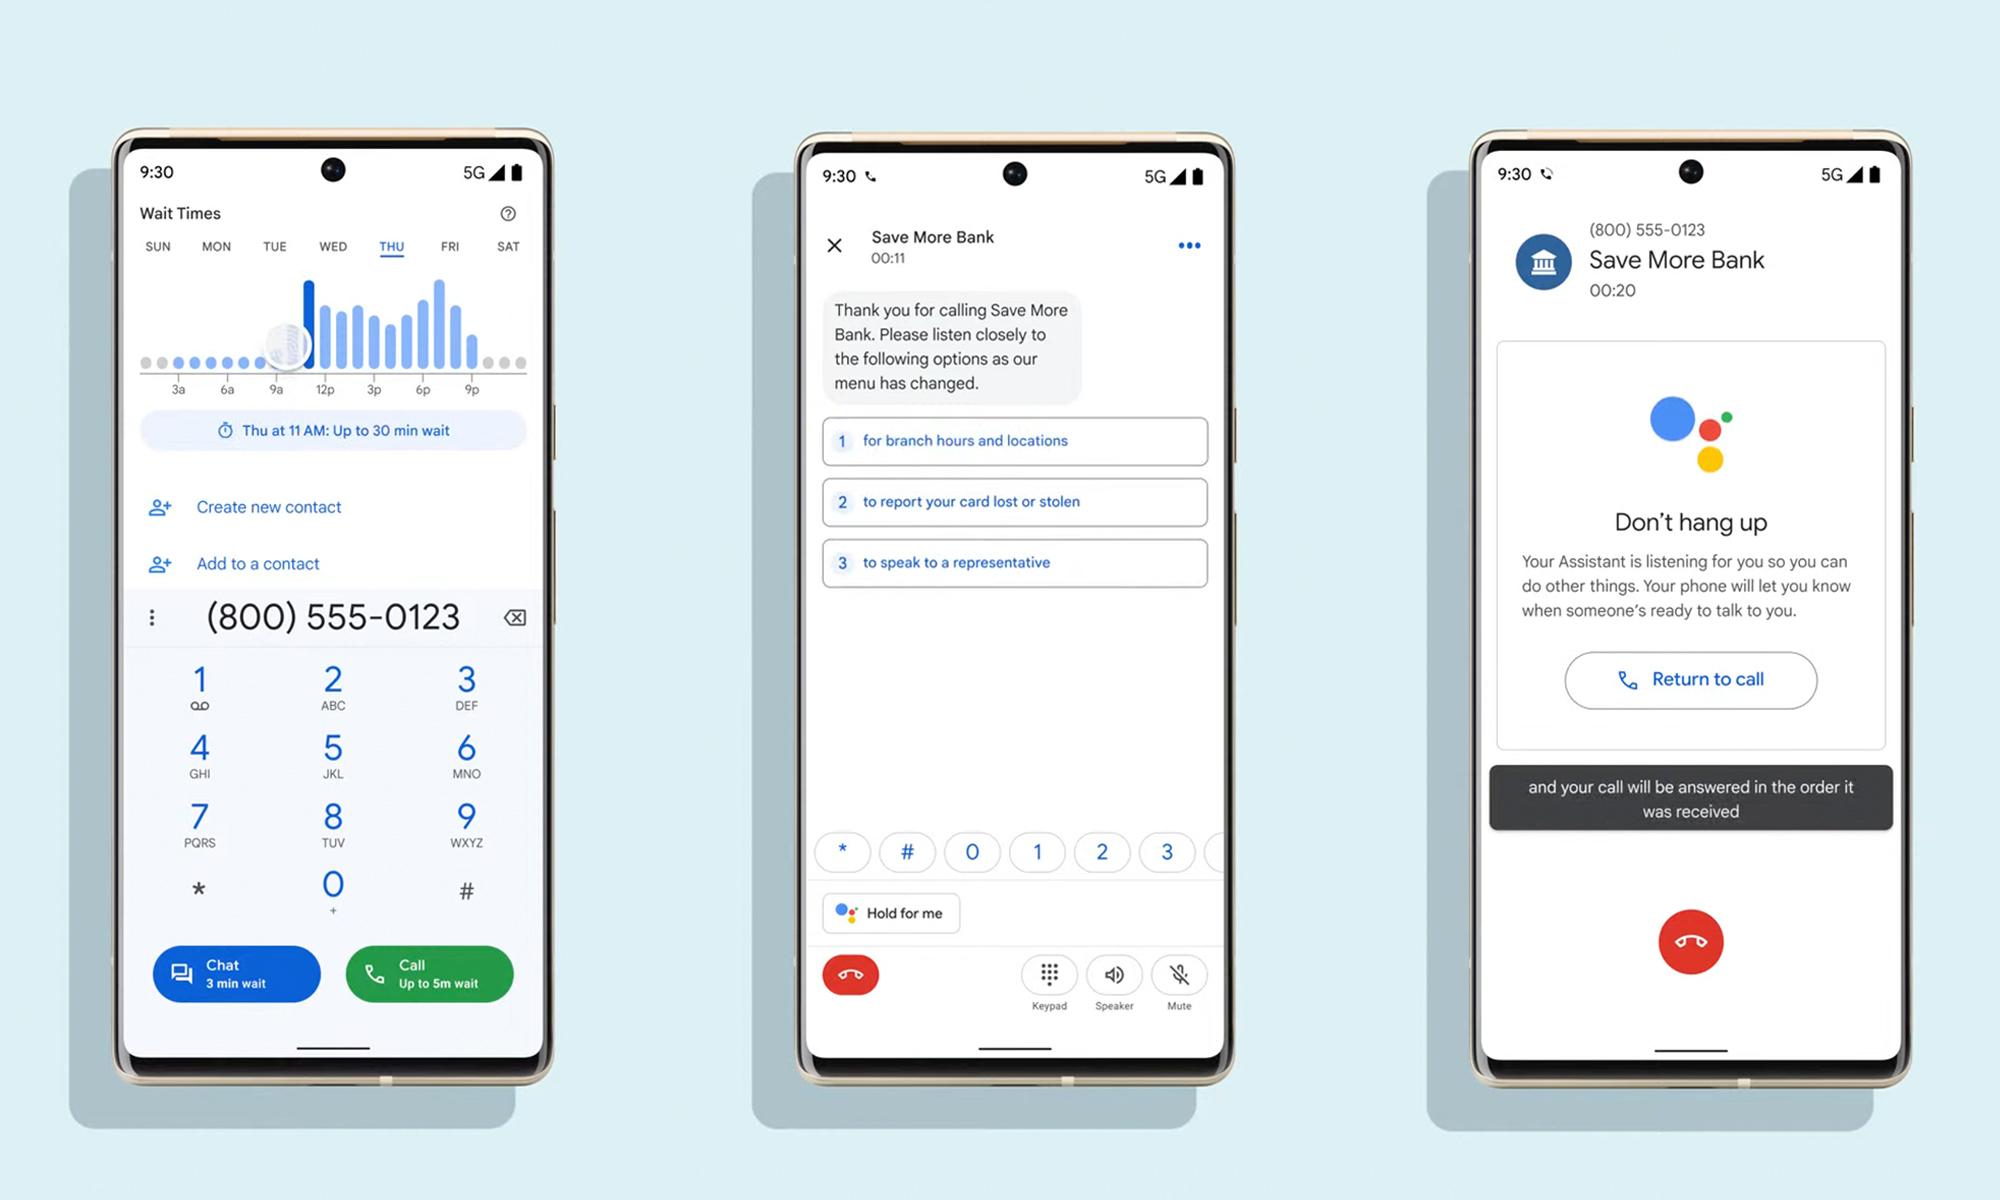 Google turns those annoying call center menus into easy-to-navigate screens